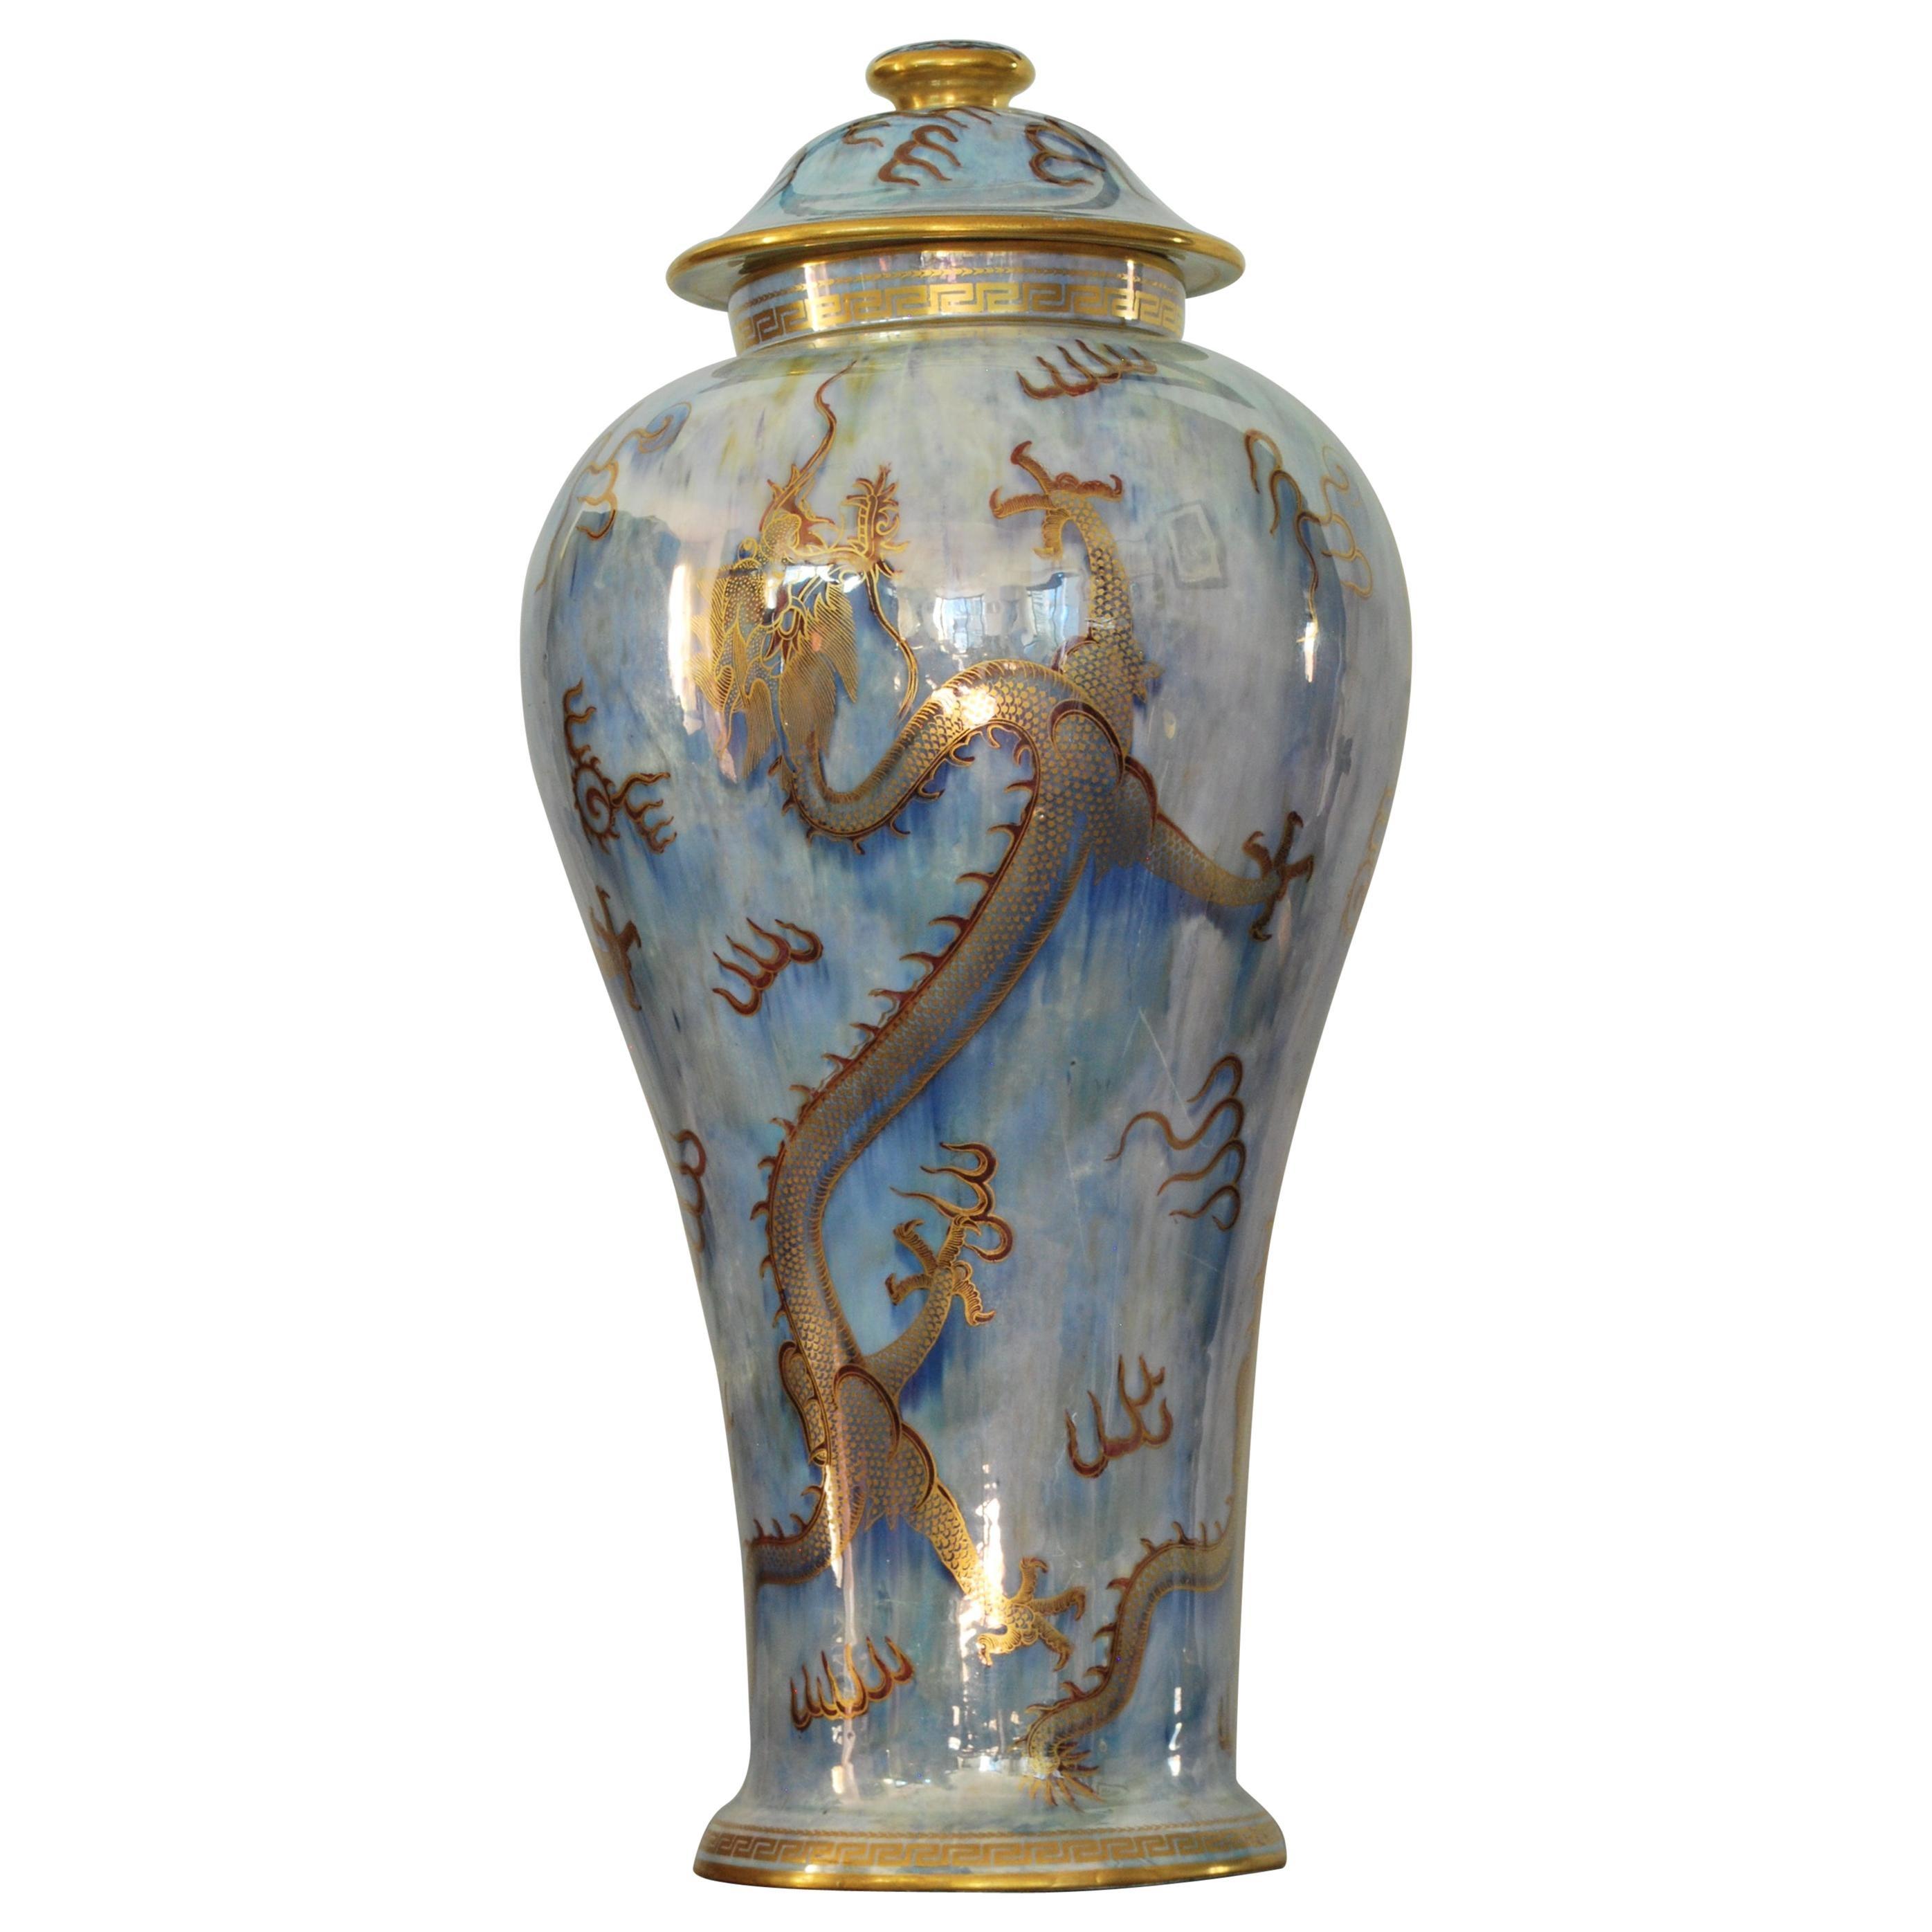 Huge Dragon Lustre Vase, Wedgwood, circa 1925